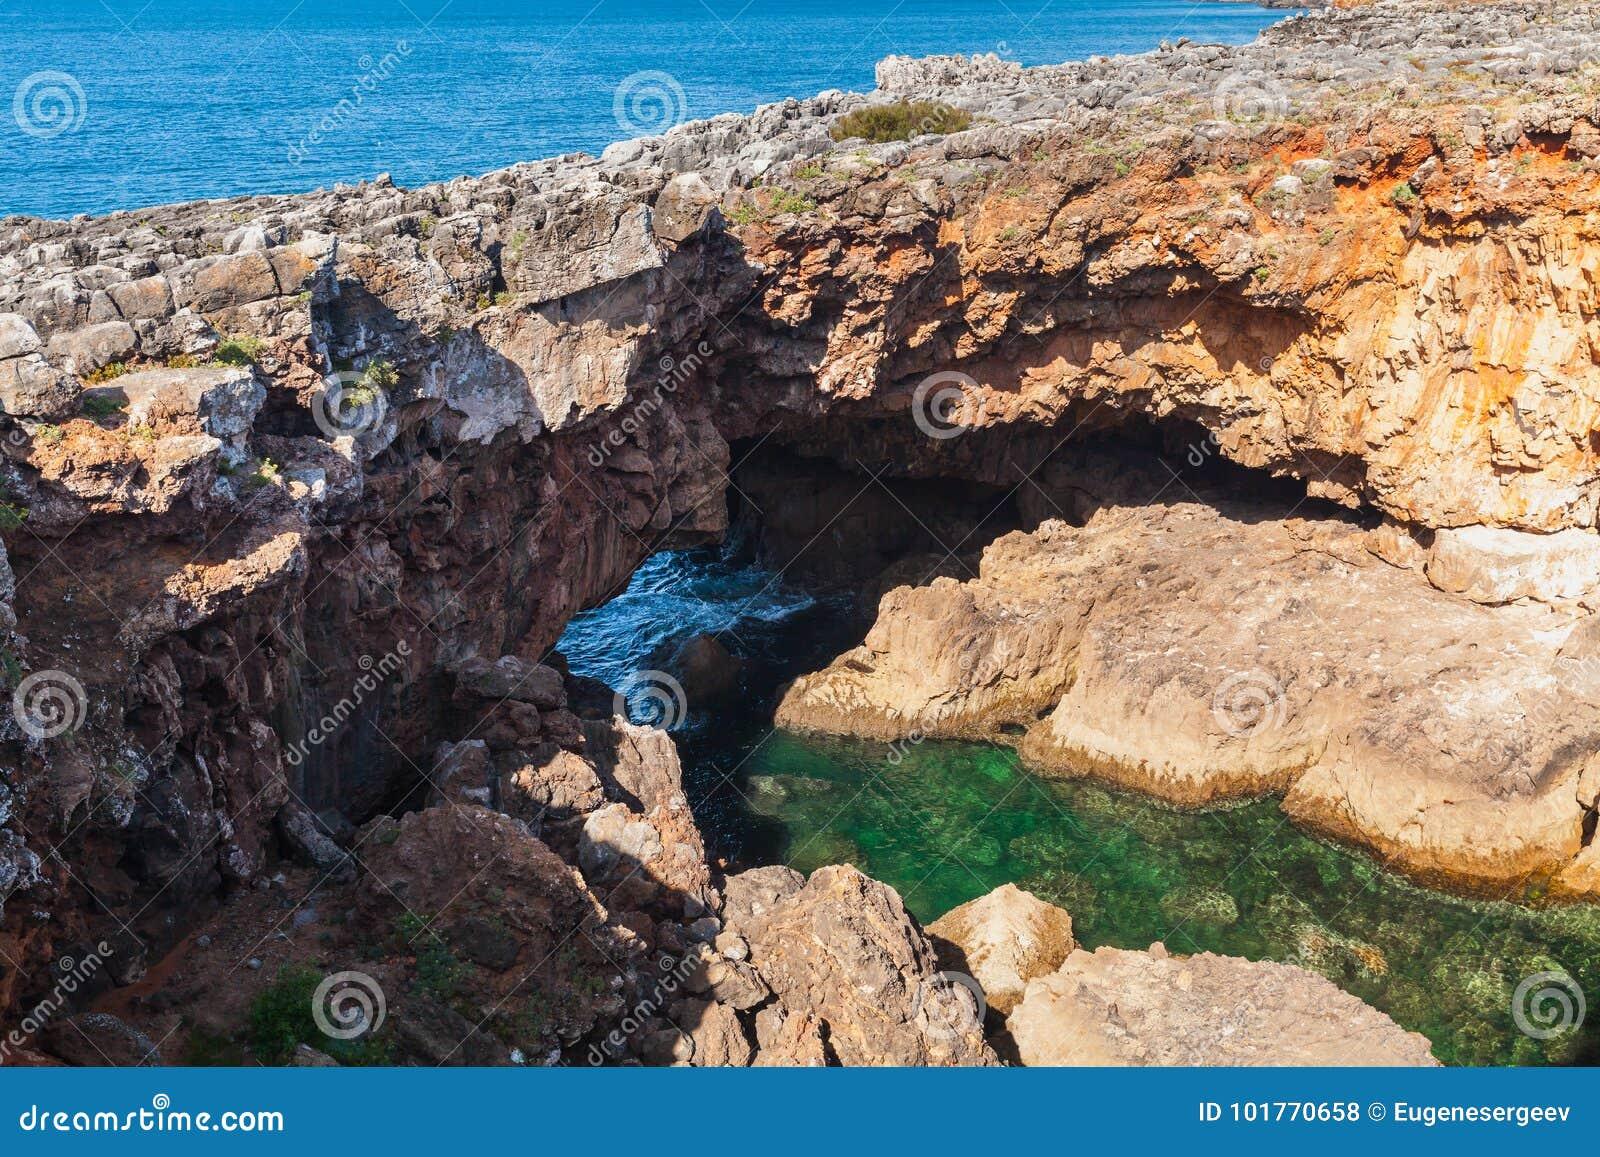 Boca hace el infierno - Cais Cais - Portugal Abismo de la boca del ` s del infierno, Portugal